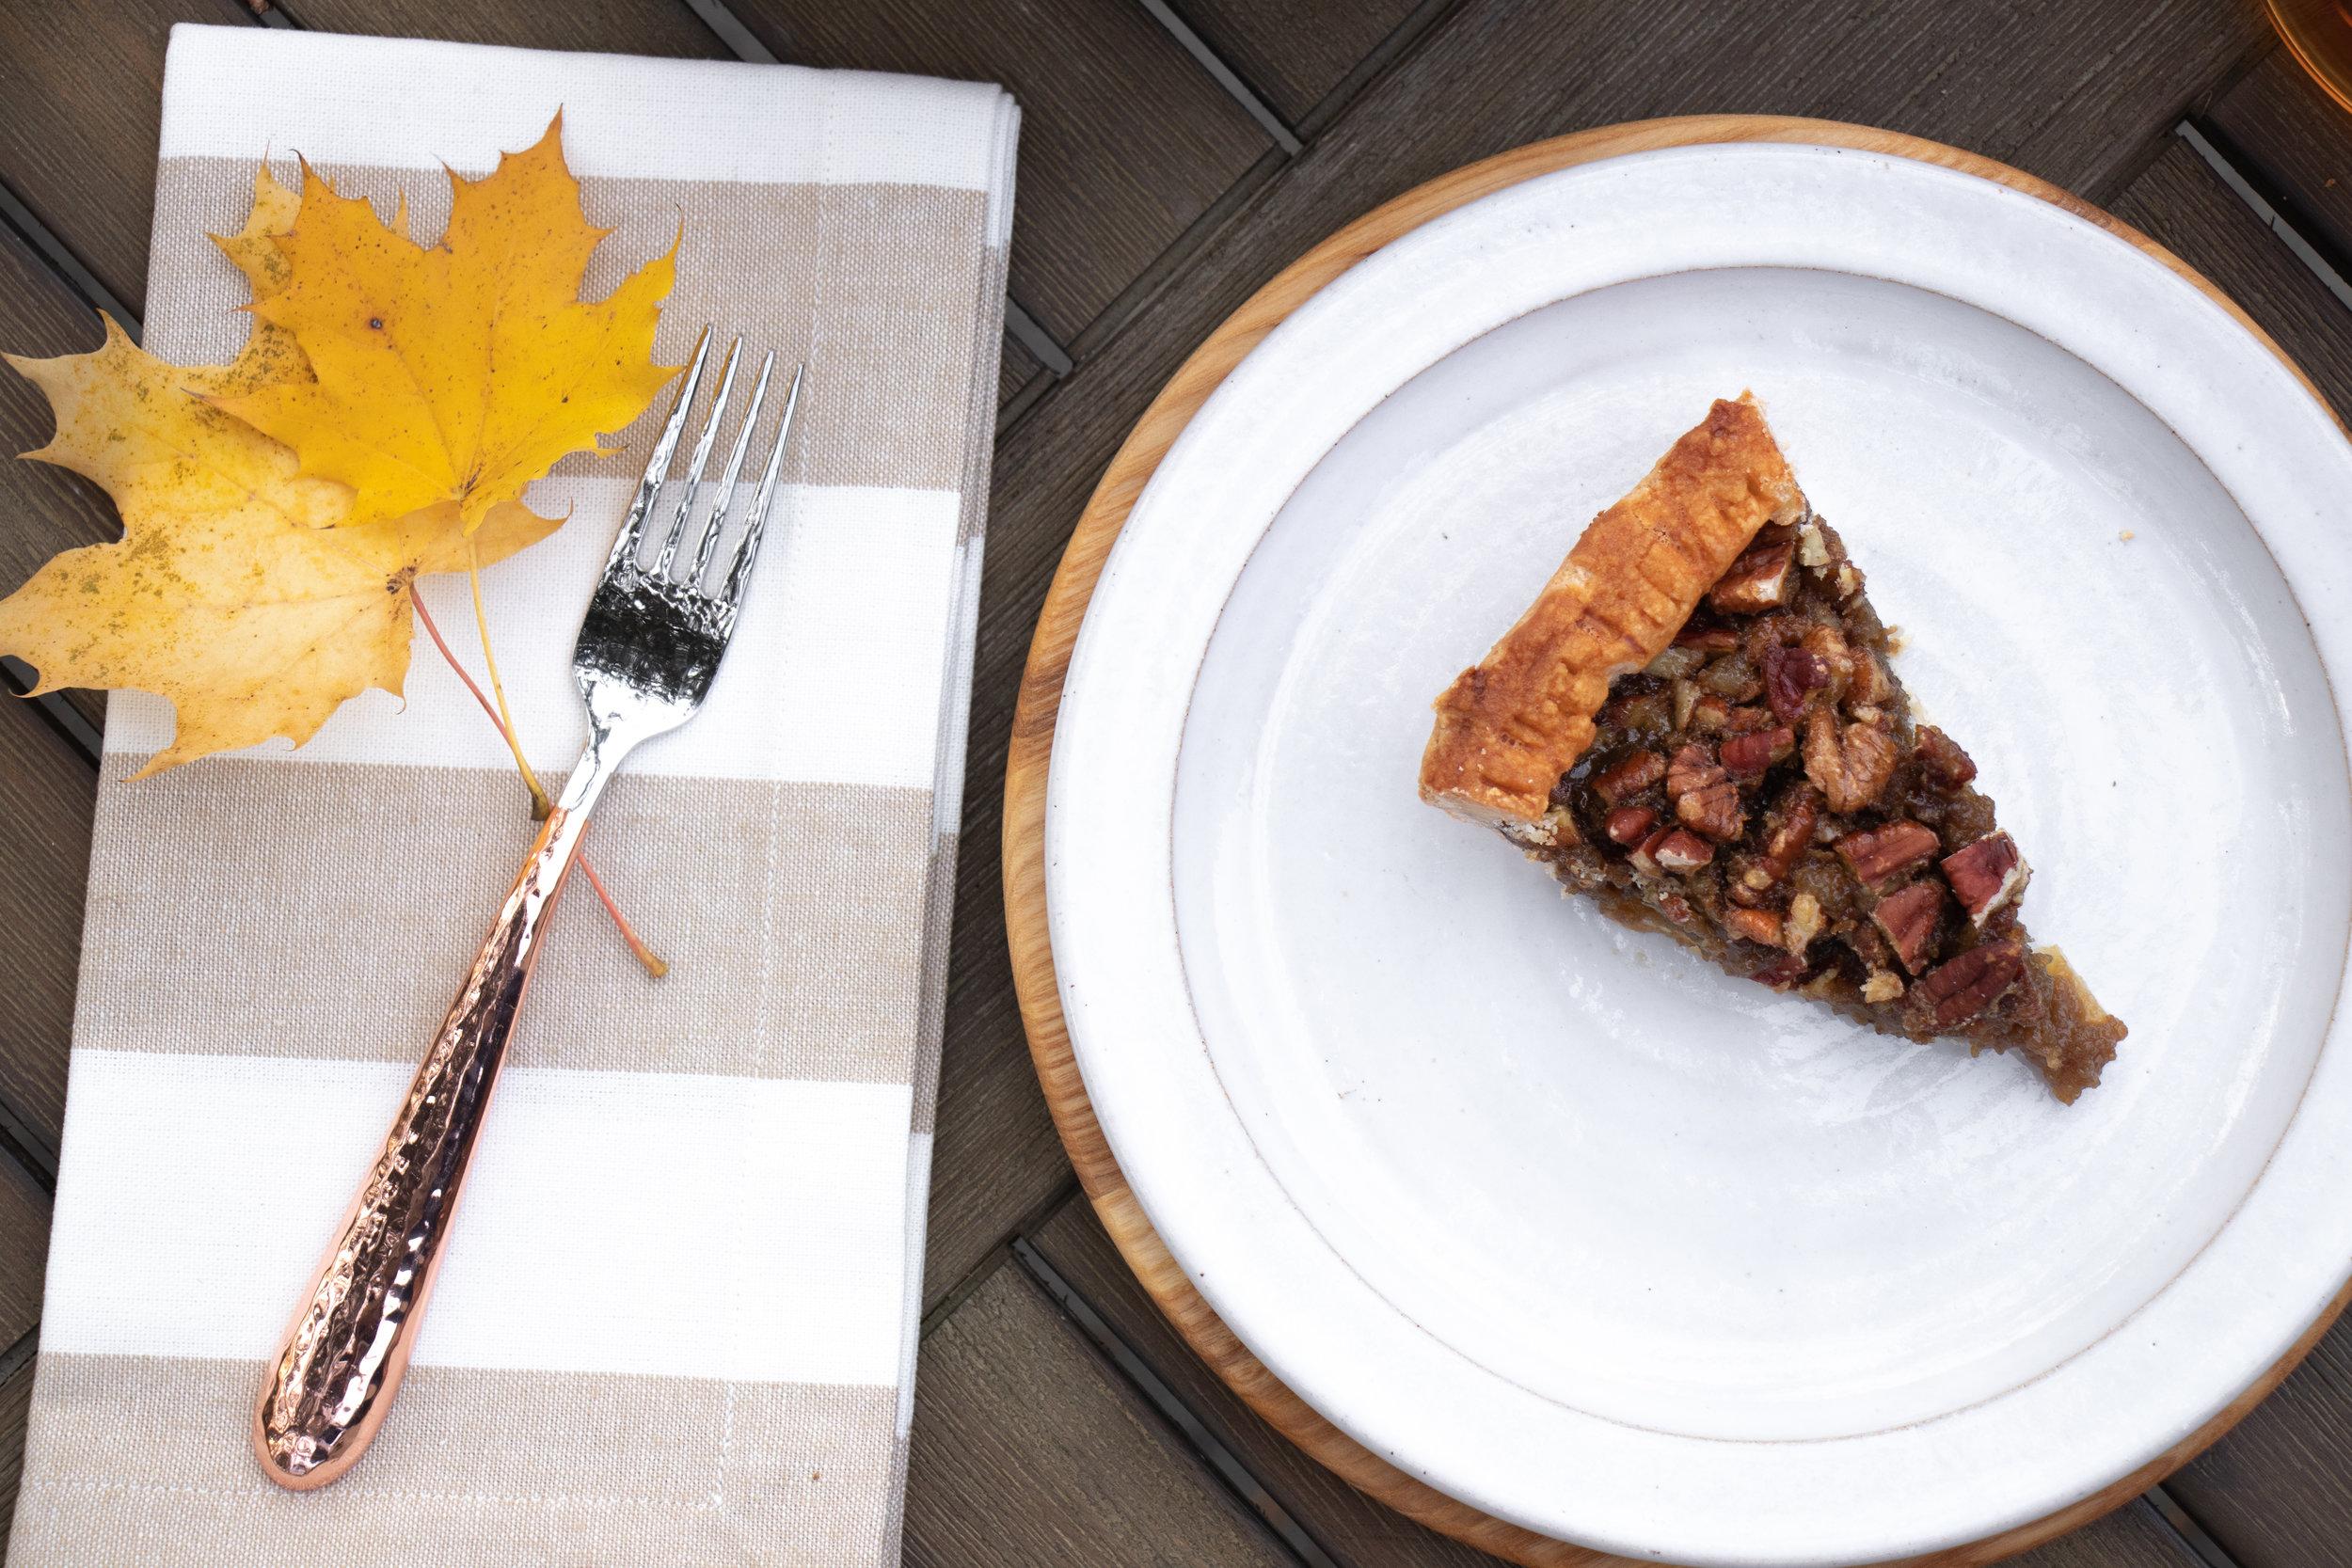 Fall_Thanksgiving Dessert_First Prize Pies_Manple Bourbon-Ginger-Pecan Pie Slice